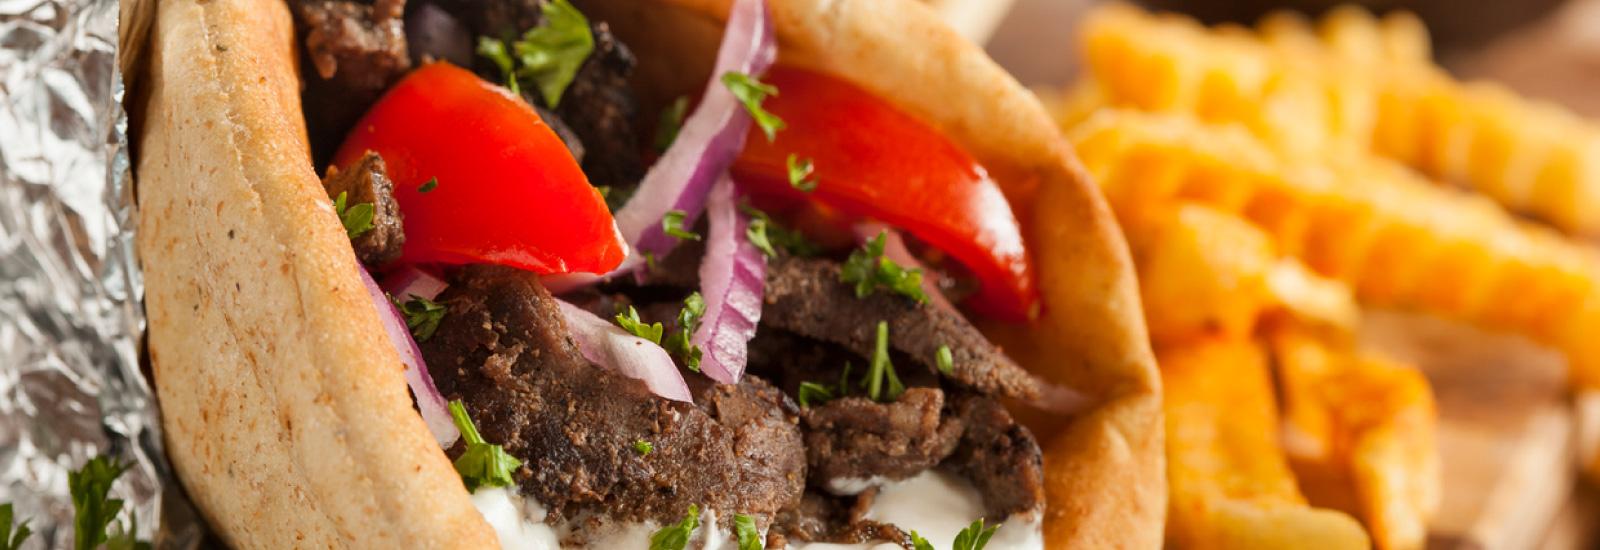 Greek Cuisine in Shalimar